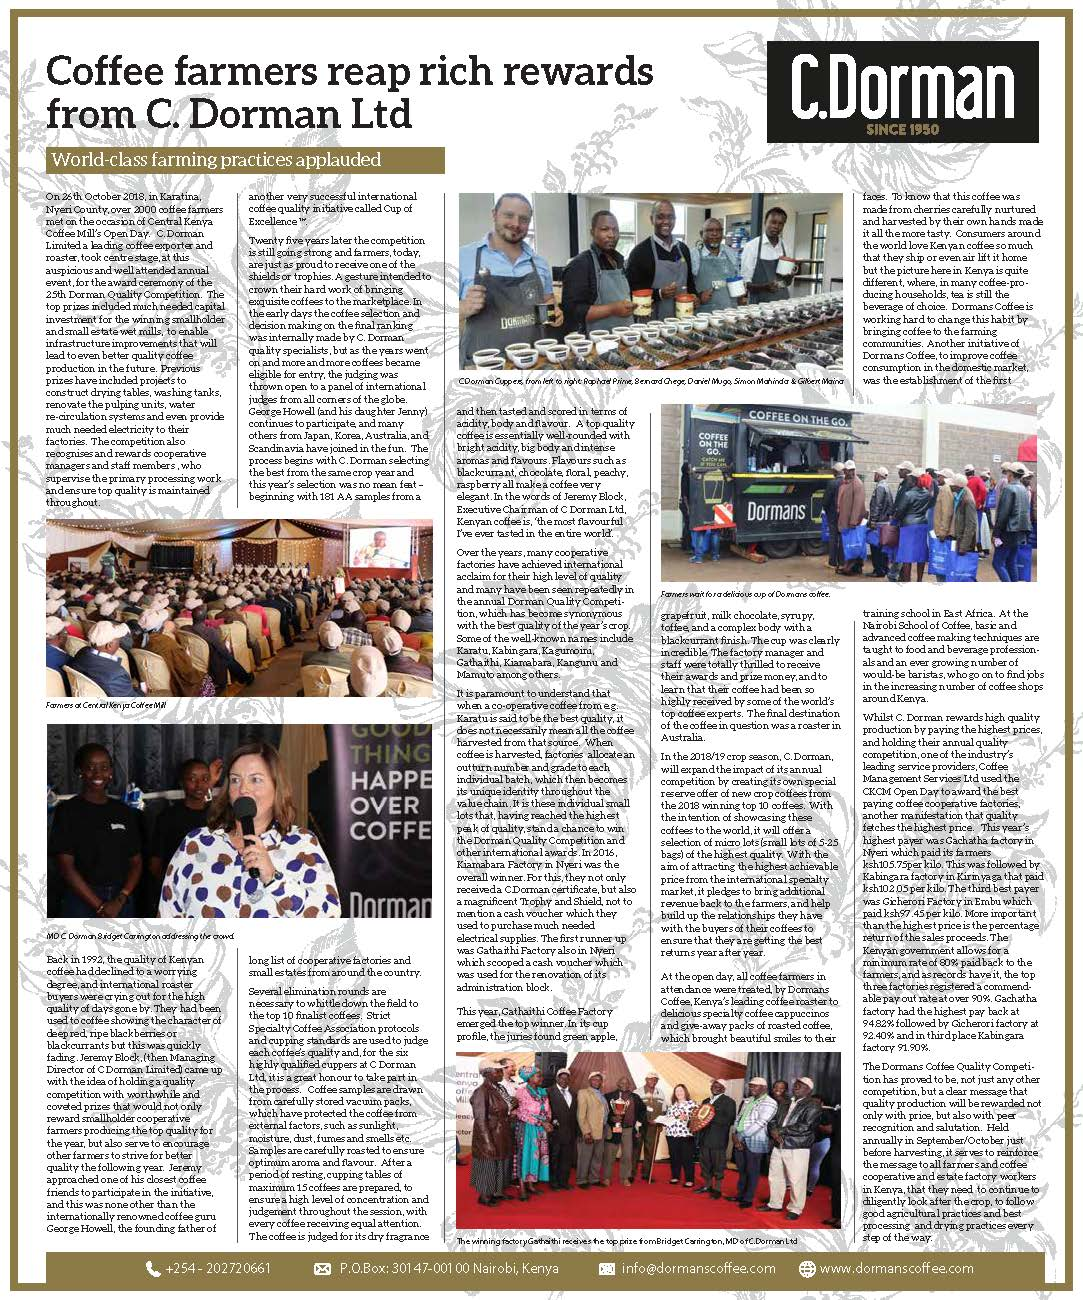 World class practices applauded. - Coffee farmers reap rich rewards from C. Dorman Ltd.